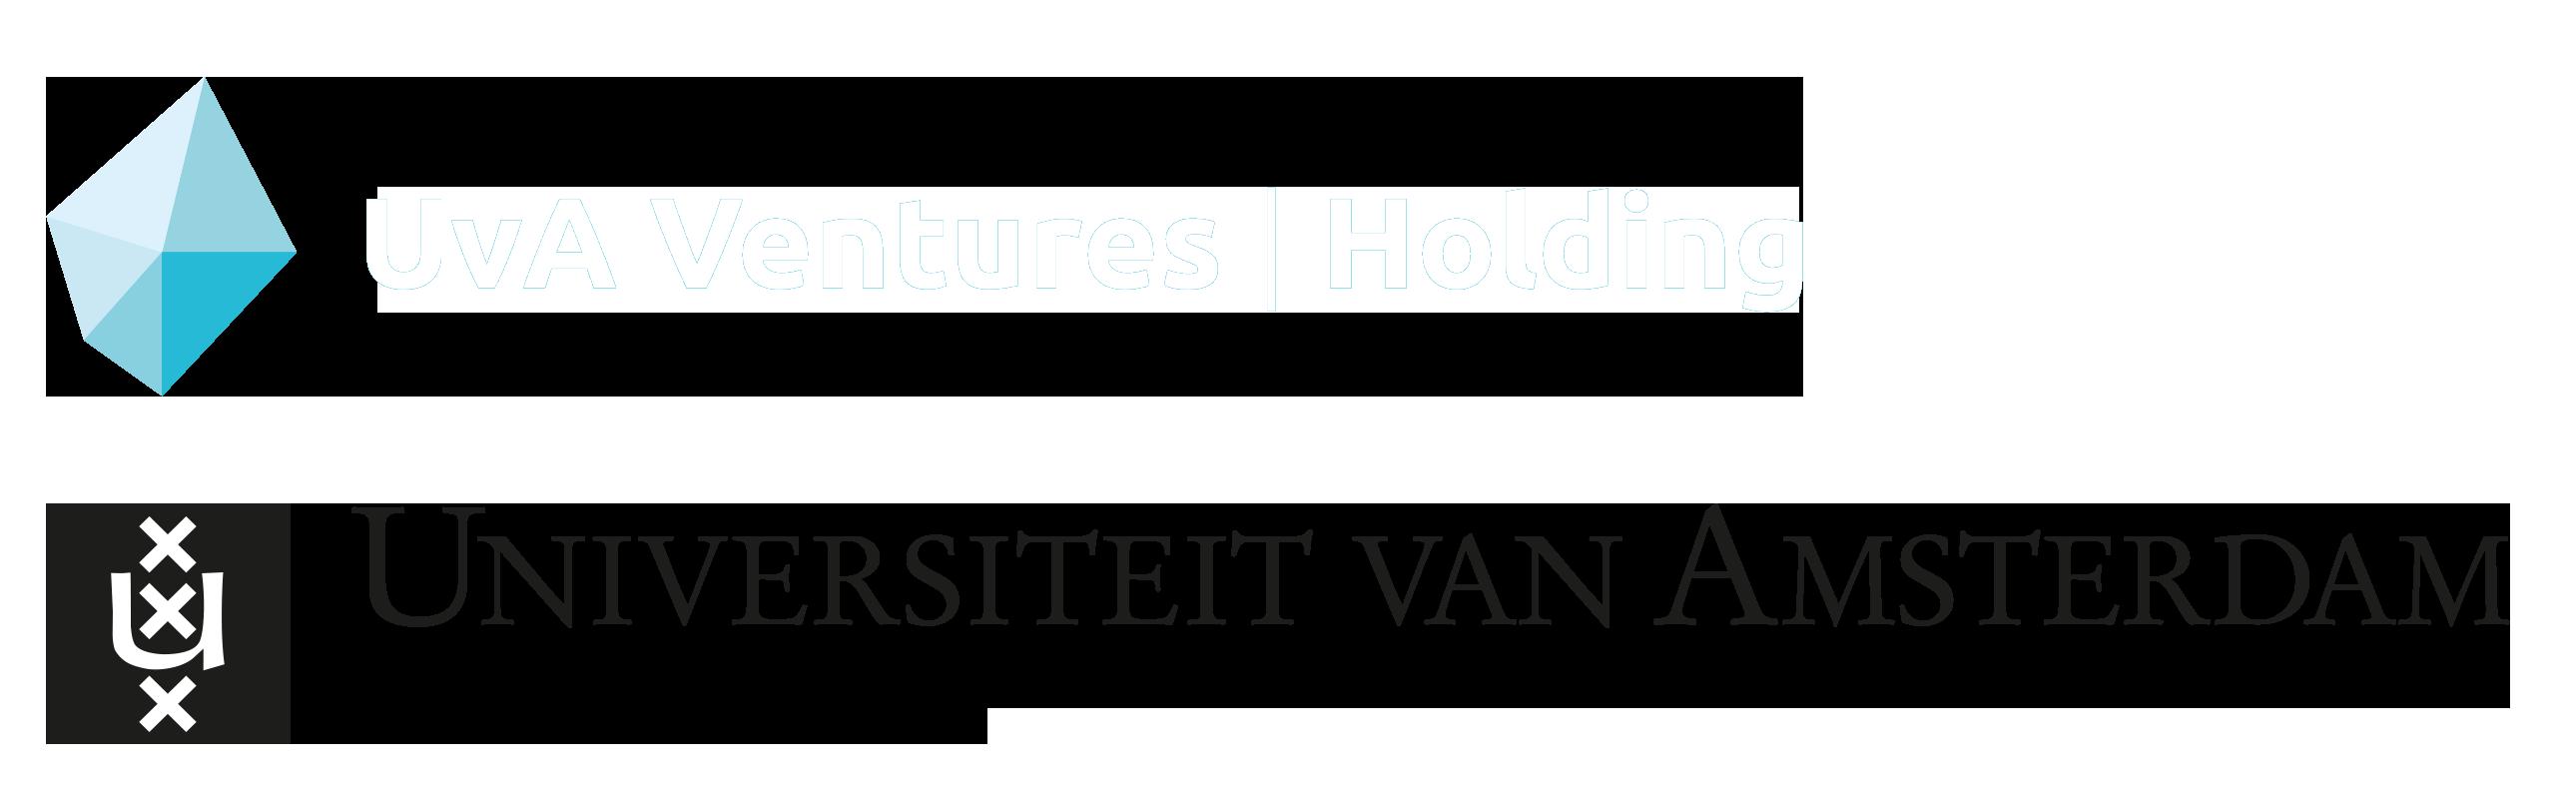 Universiteit van Amsterdam logo